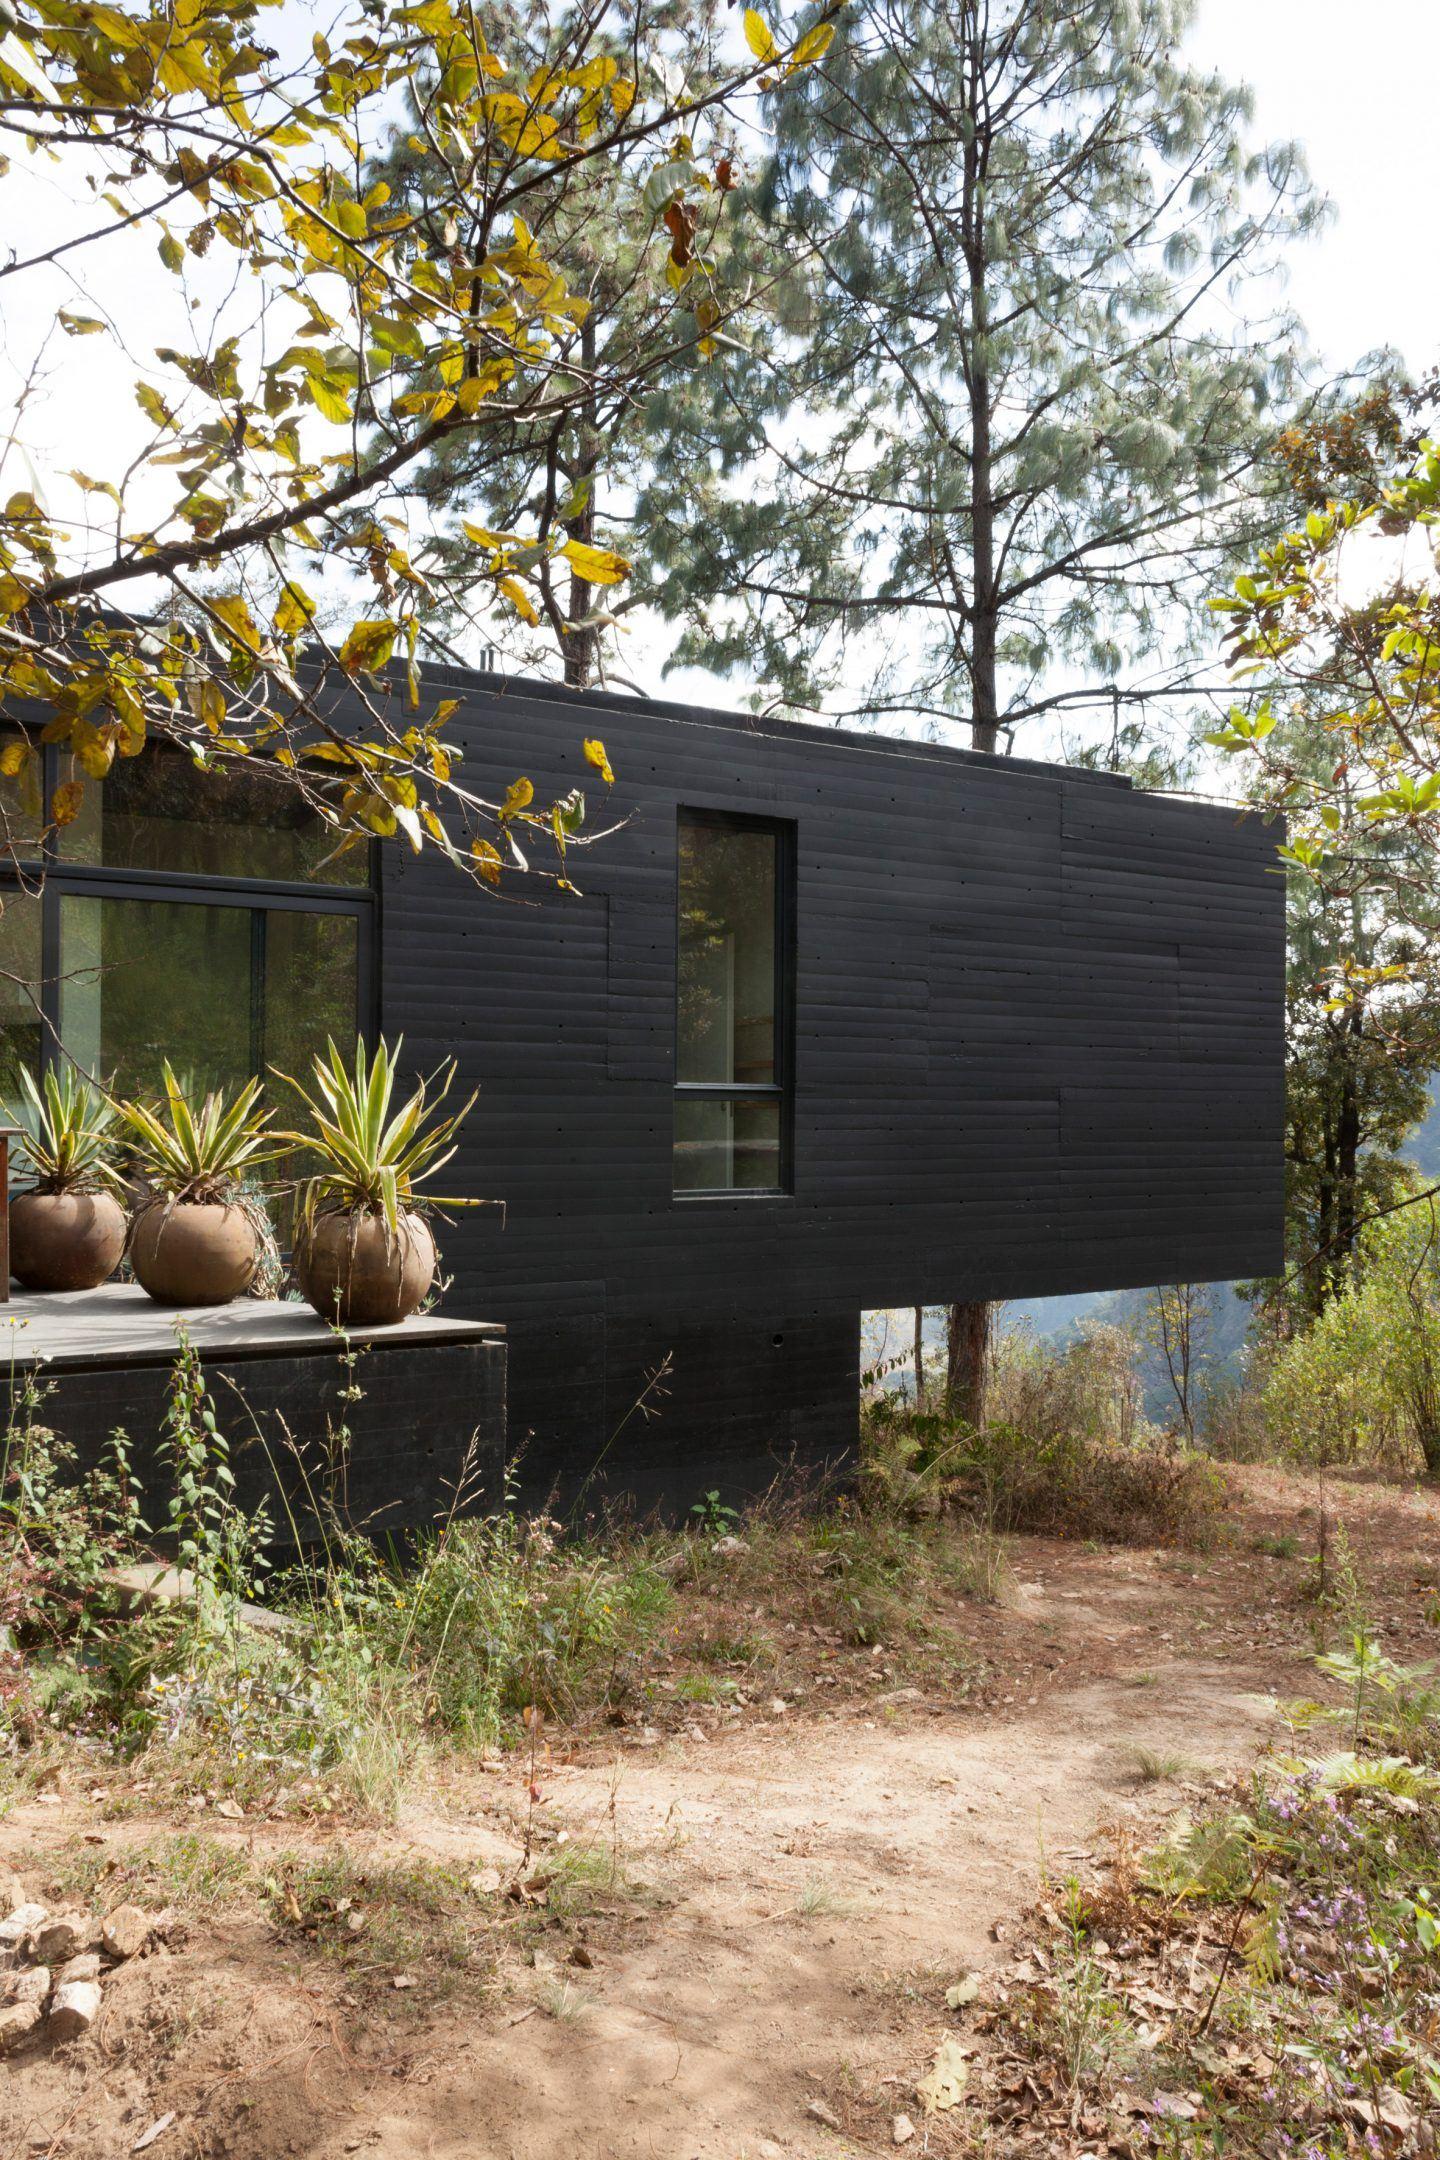 IGNANT-Architecture-Cadaval-Sola-Morales-Casa-De-La-Roca-7